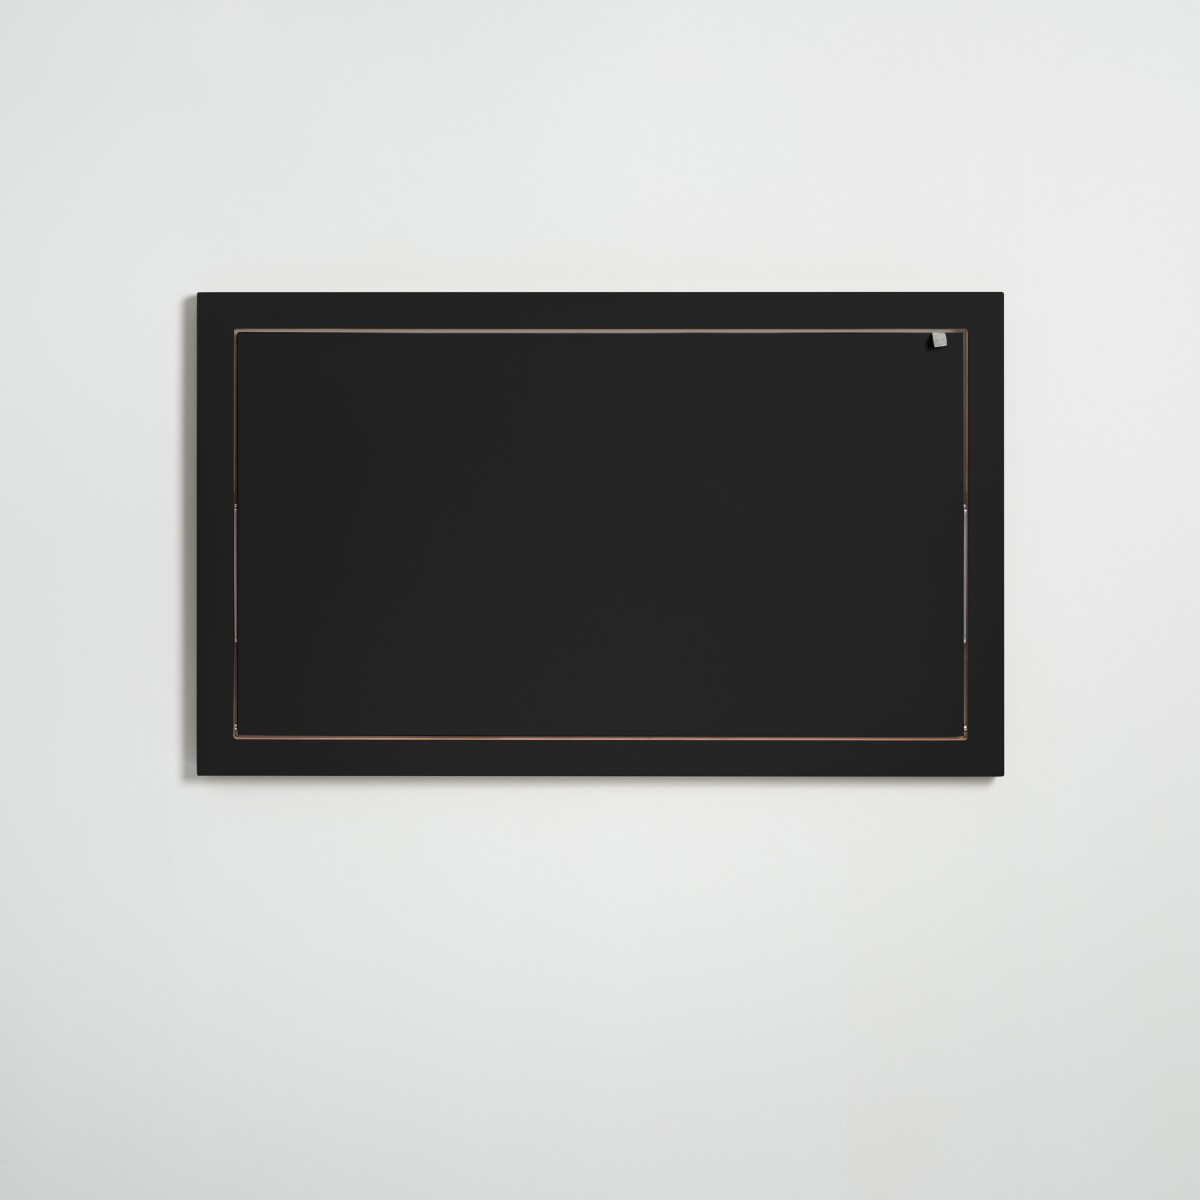 AMBIVALENZ Fläpps Sekretär/in 100x60 - 1